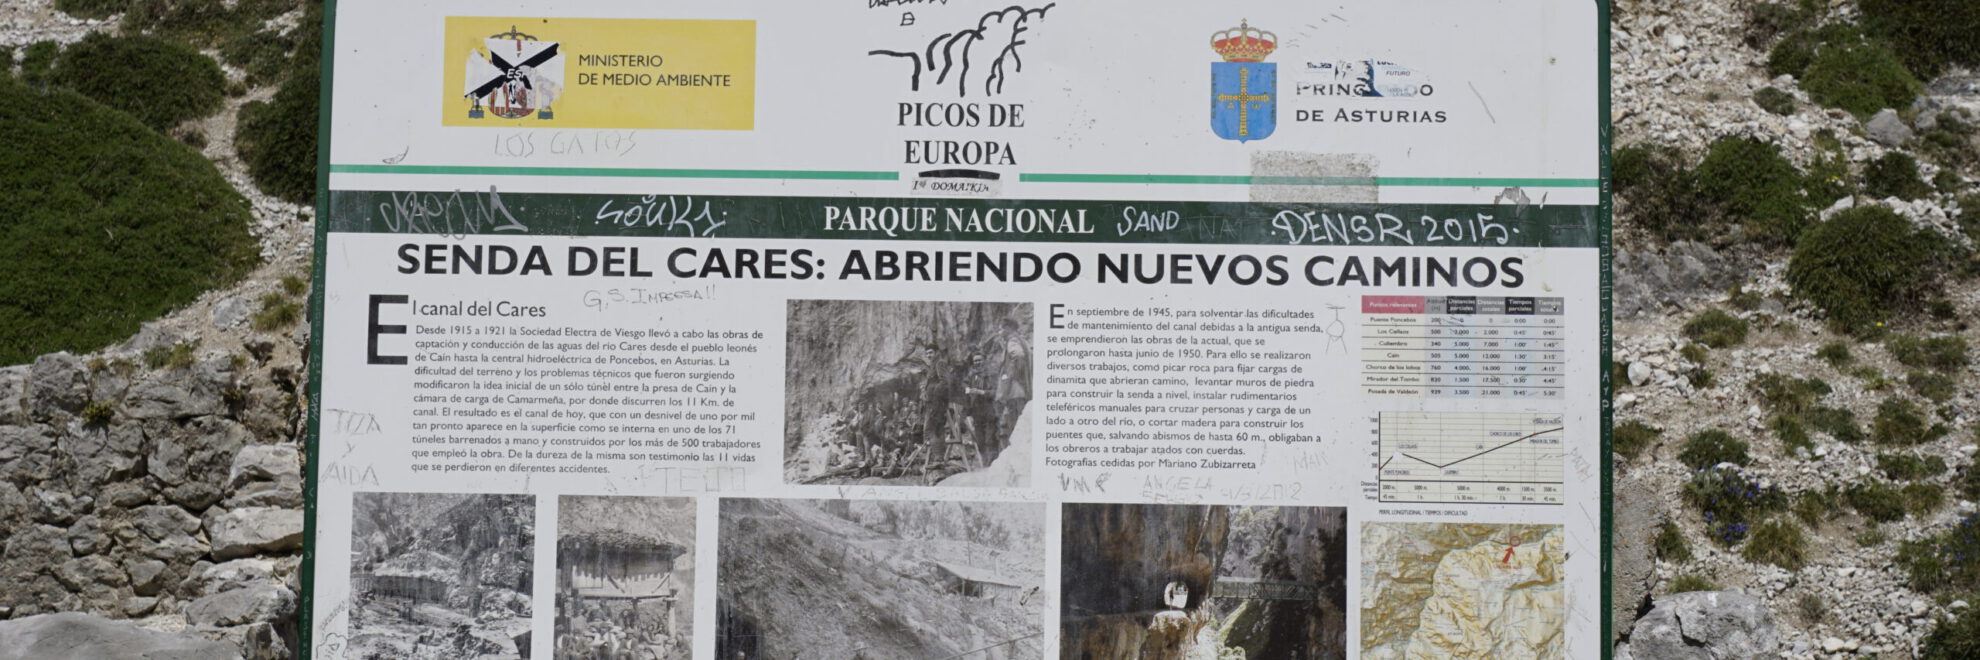 Ruta del Cares: Fotoalbum